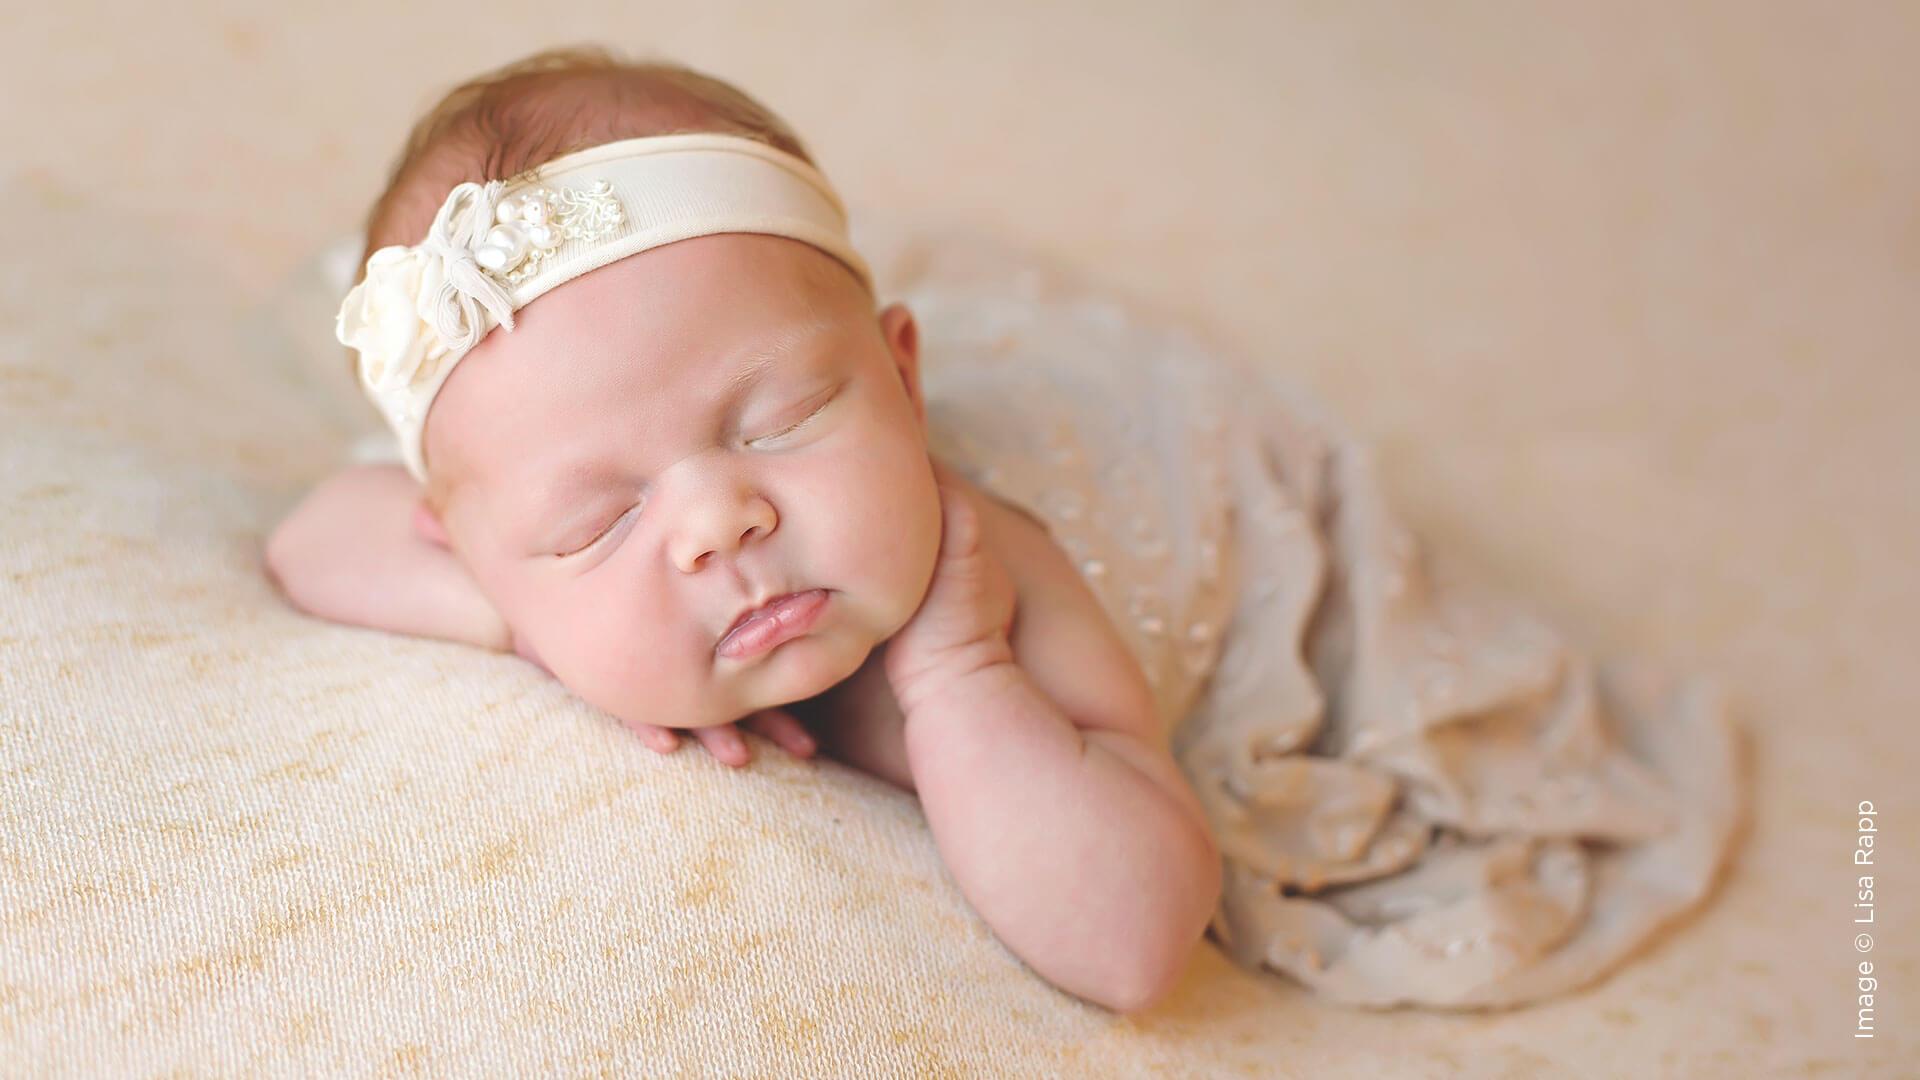 Newborn Photography: Starting From Scratch